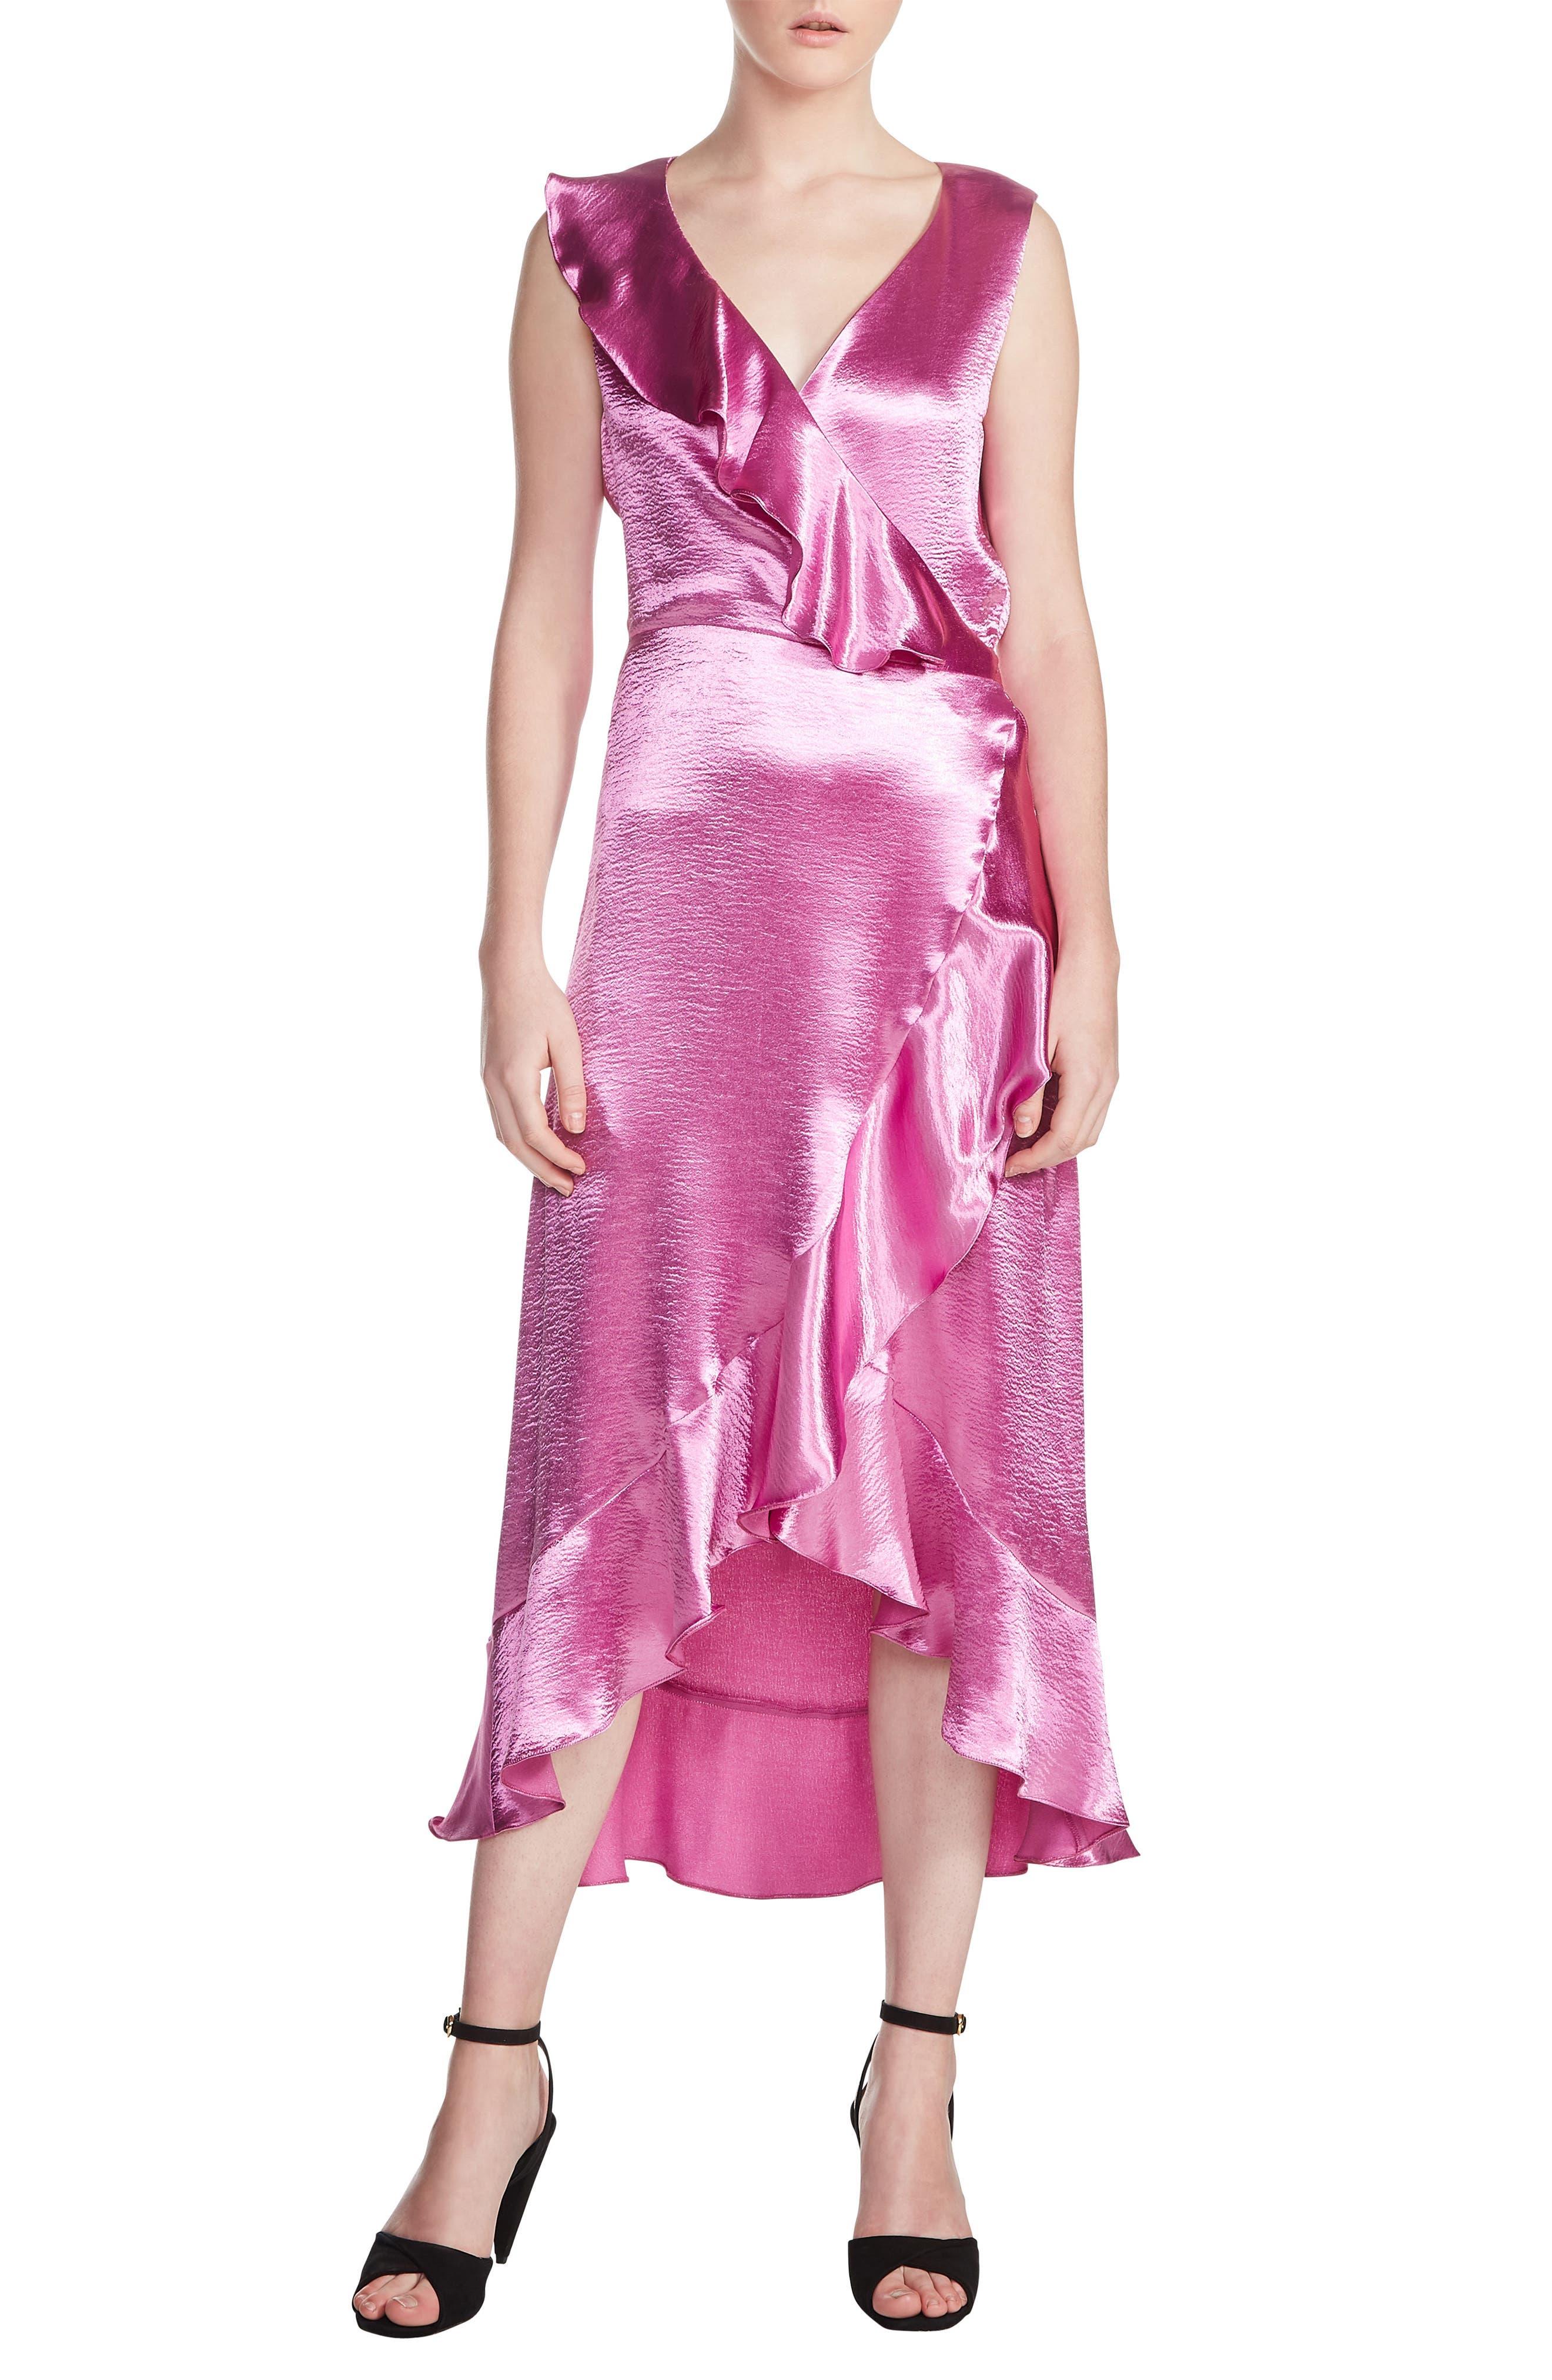 Ripple Ruffle Detail Satin Wrap Dress,                         Main,                         color, 650